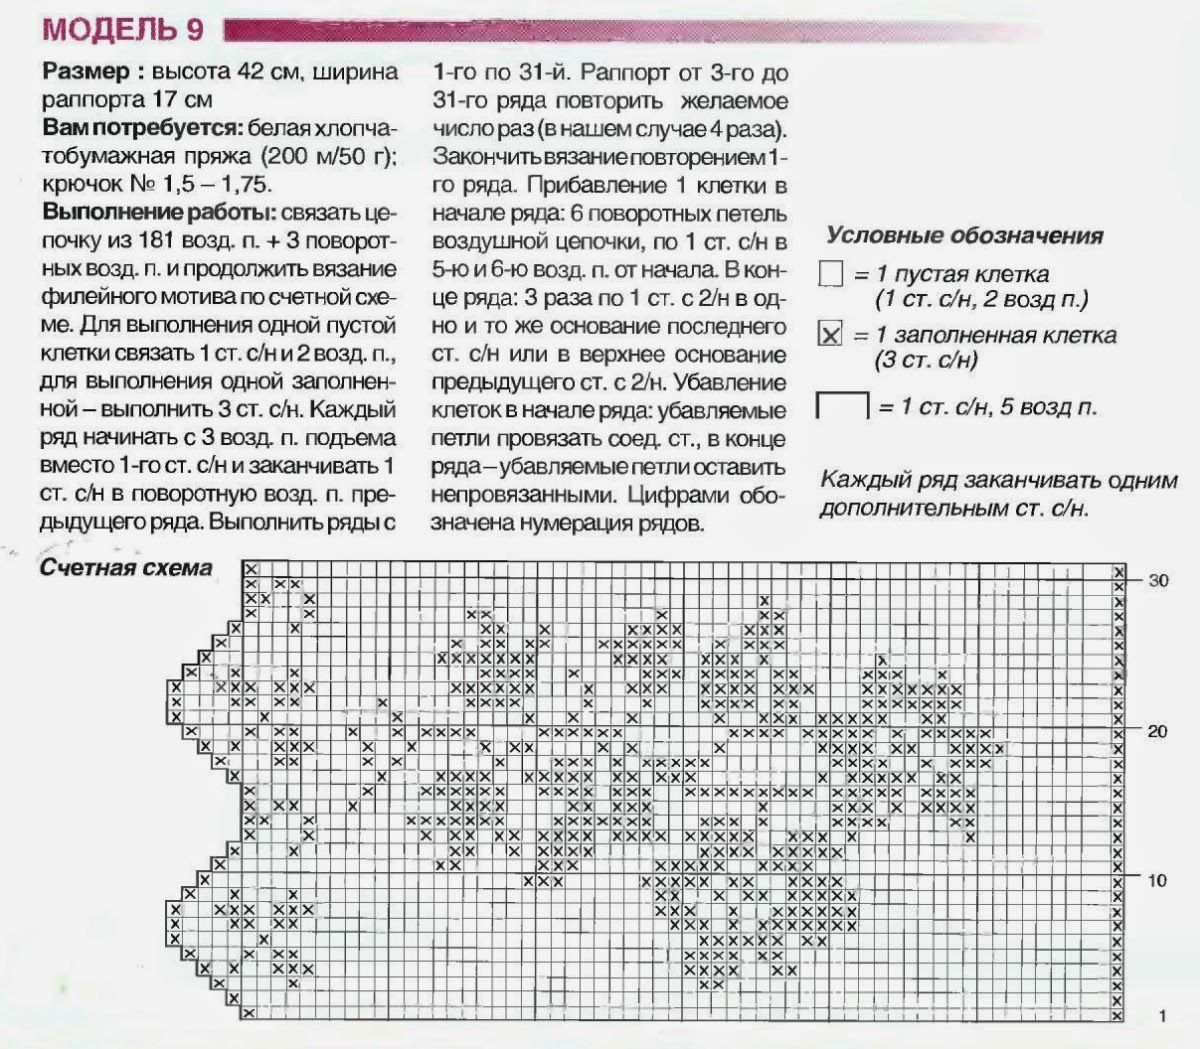 tendina_bistrot5_schema.JPG (1200×1049)